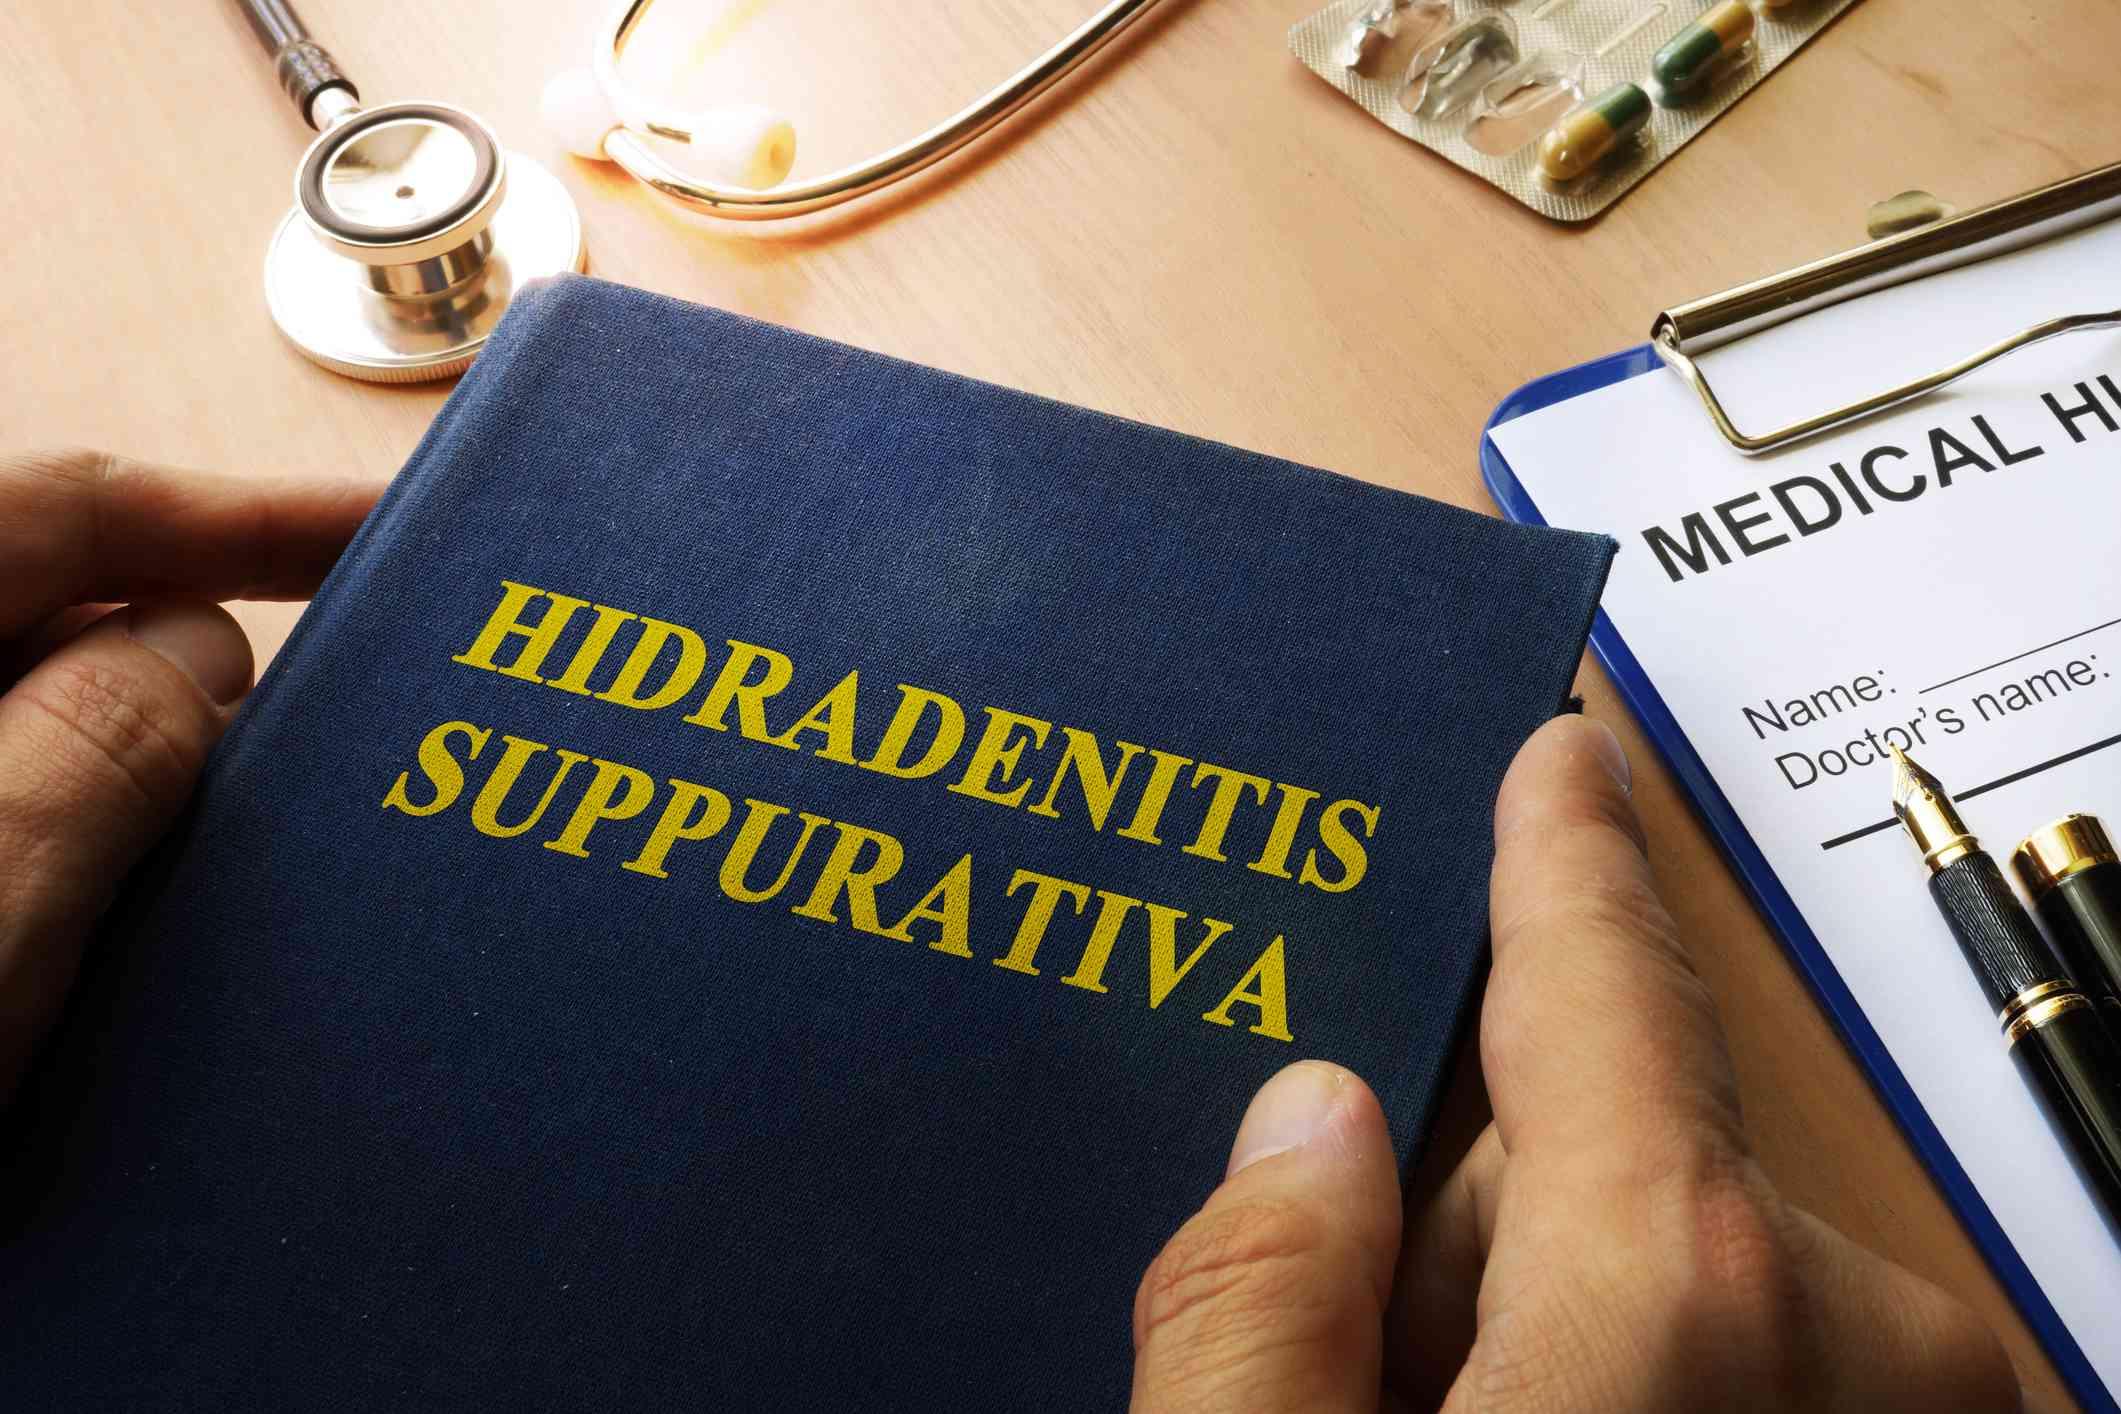 Hidradenitis Suppurativa text